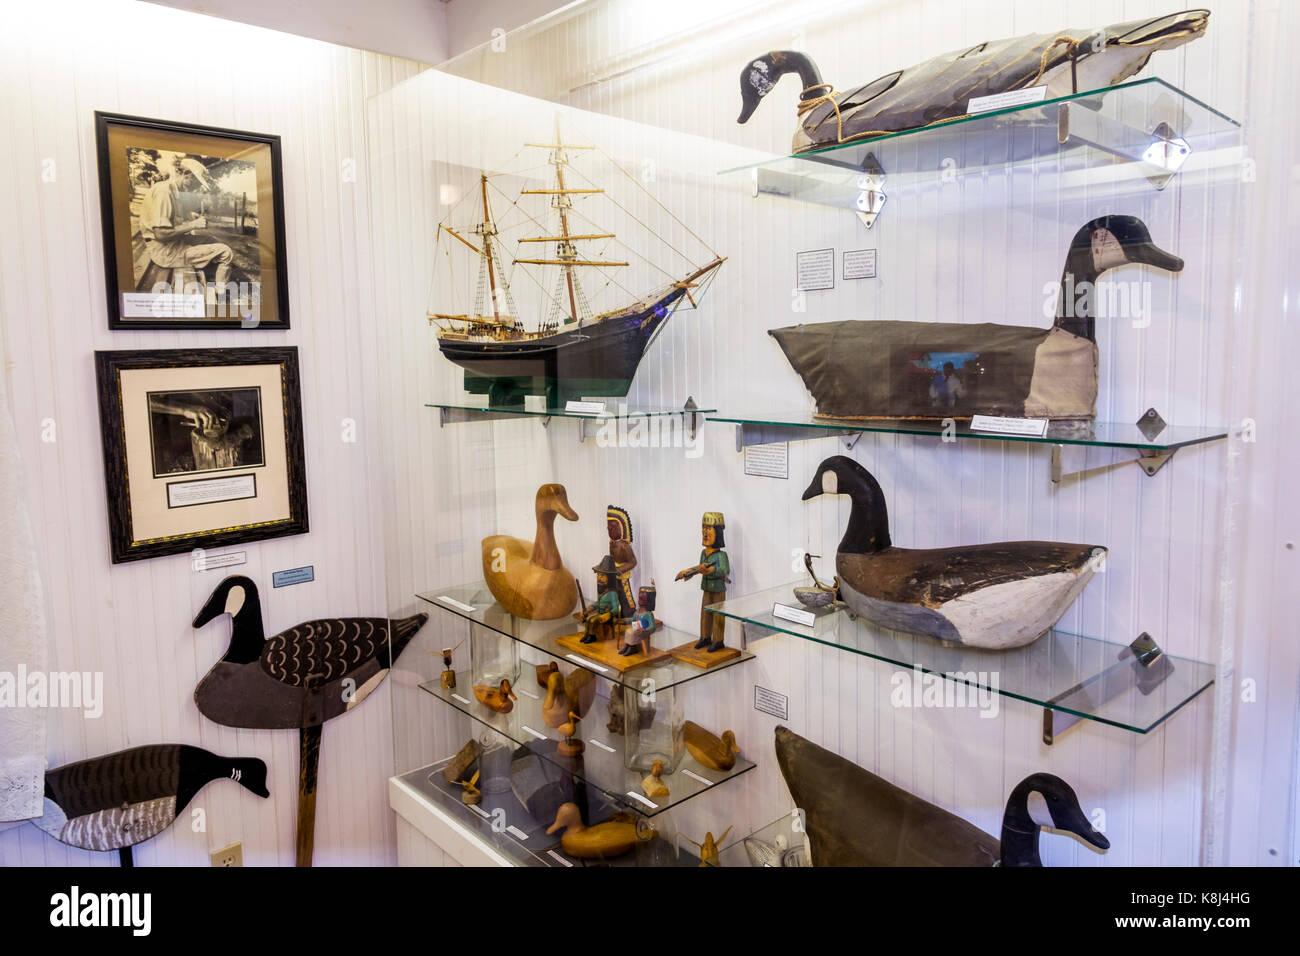 Outer Banks North Carolina NC Ocracoke Island Ocracoke Preservation Society museum David Williams house inside exhibit - Stock Image